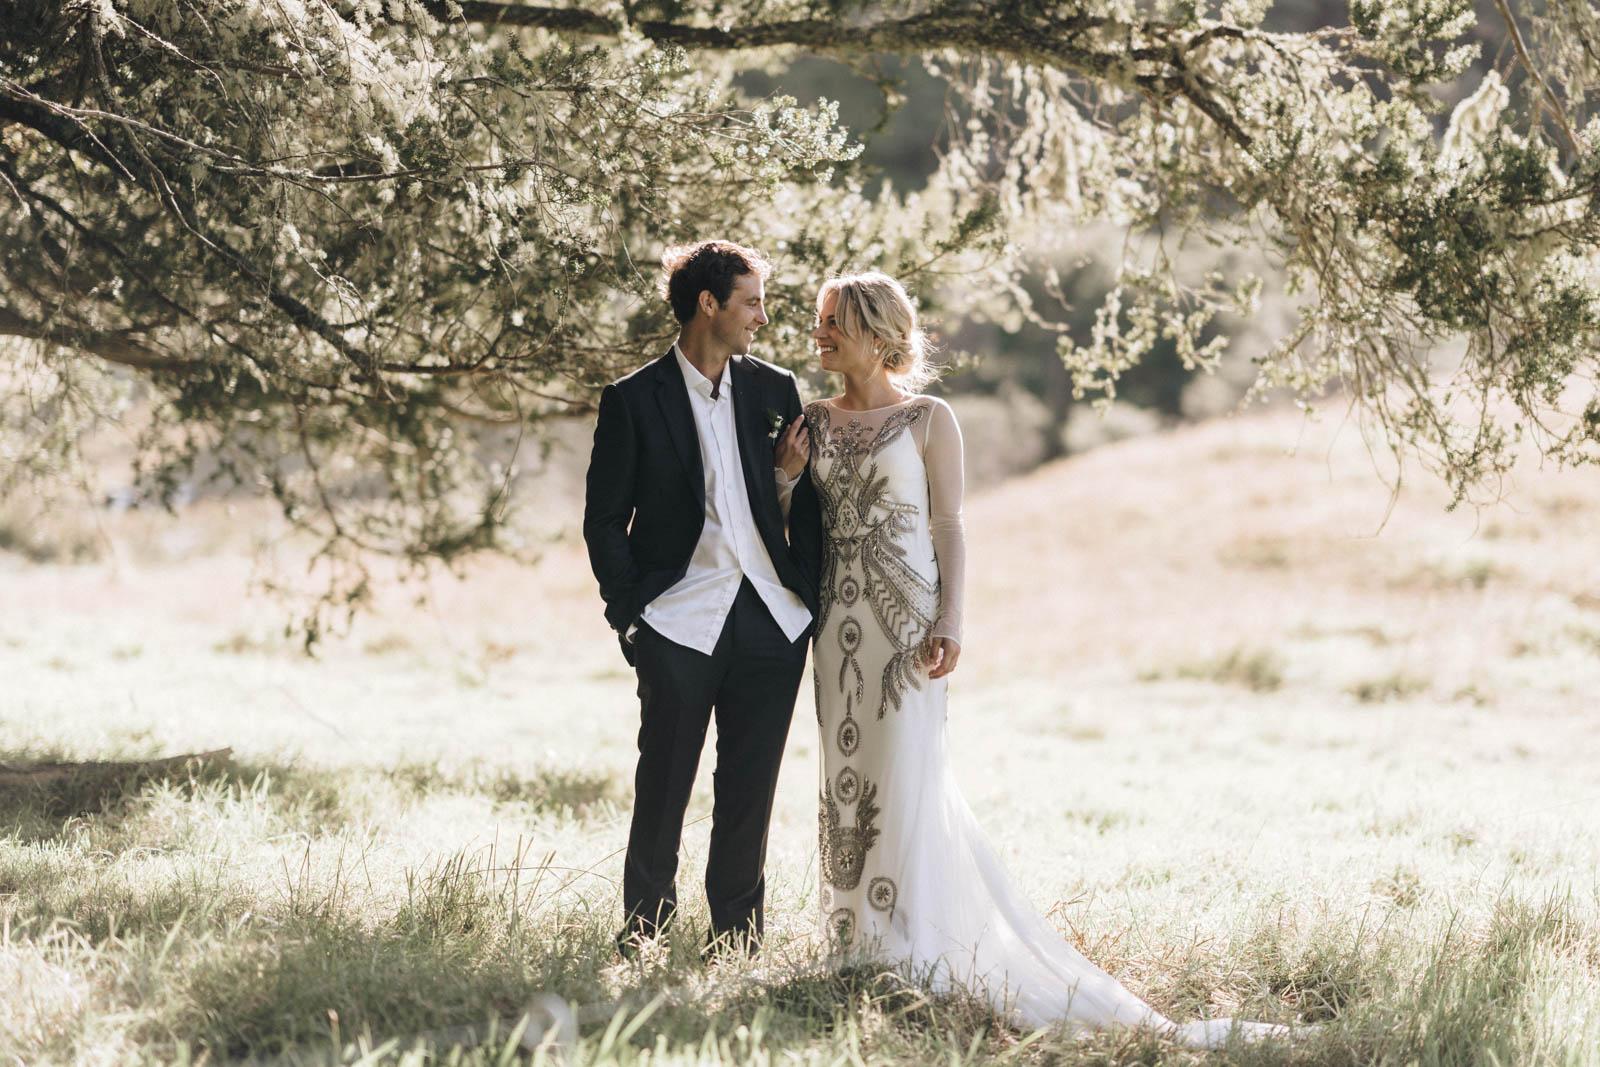 newfound-l-i-coromandel-wedding-photographer-1731-A9_03737